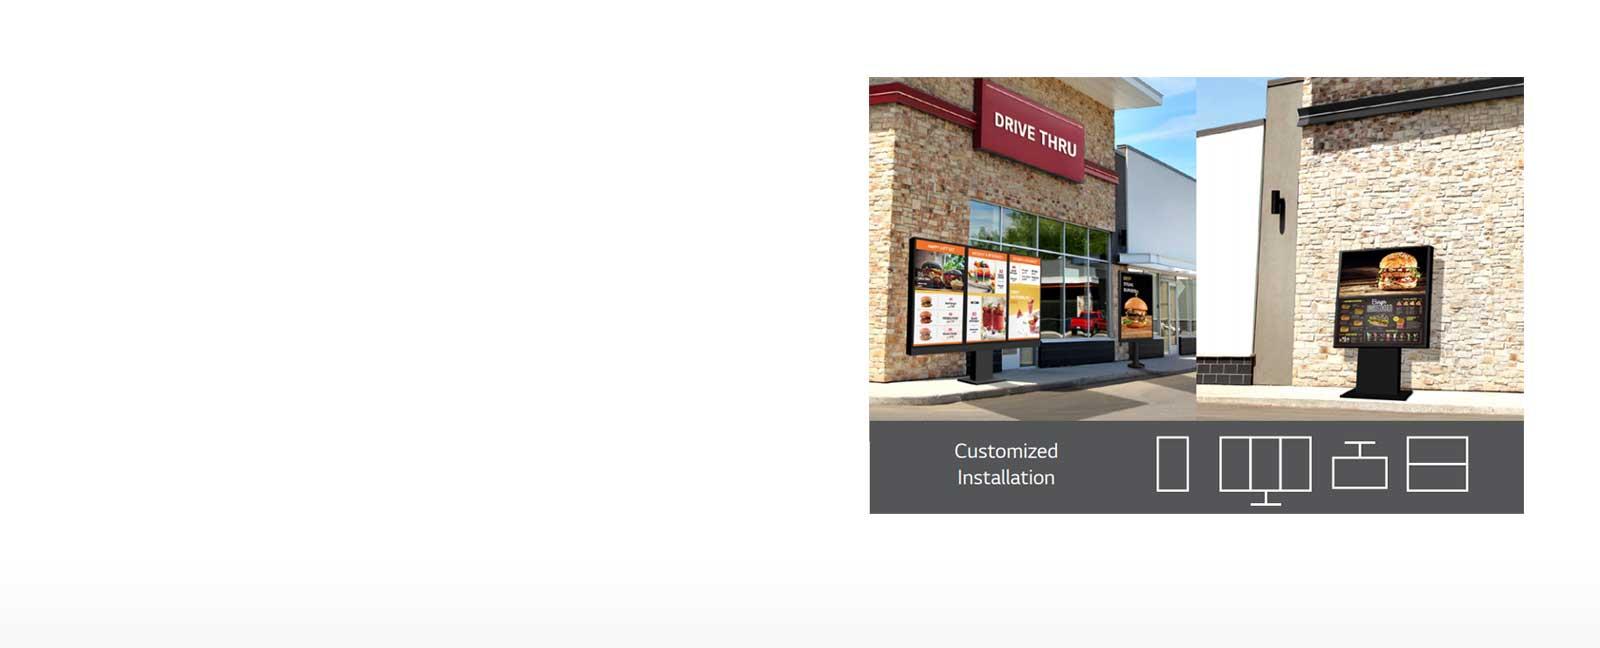 Easy Integration & Customizable1